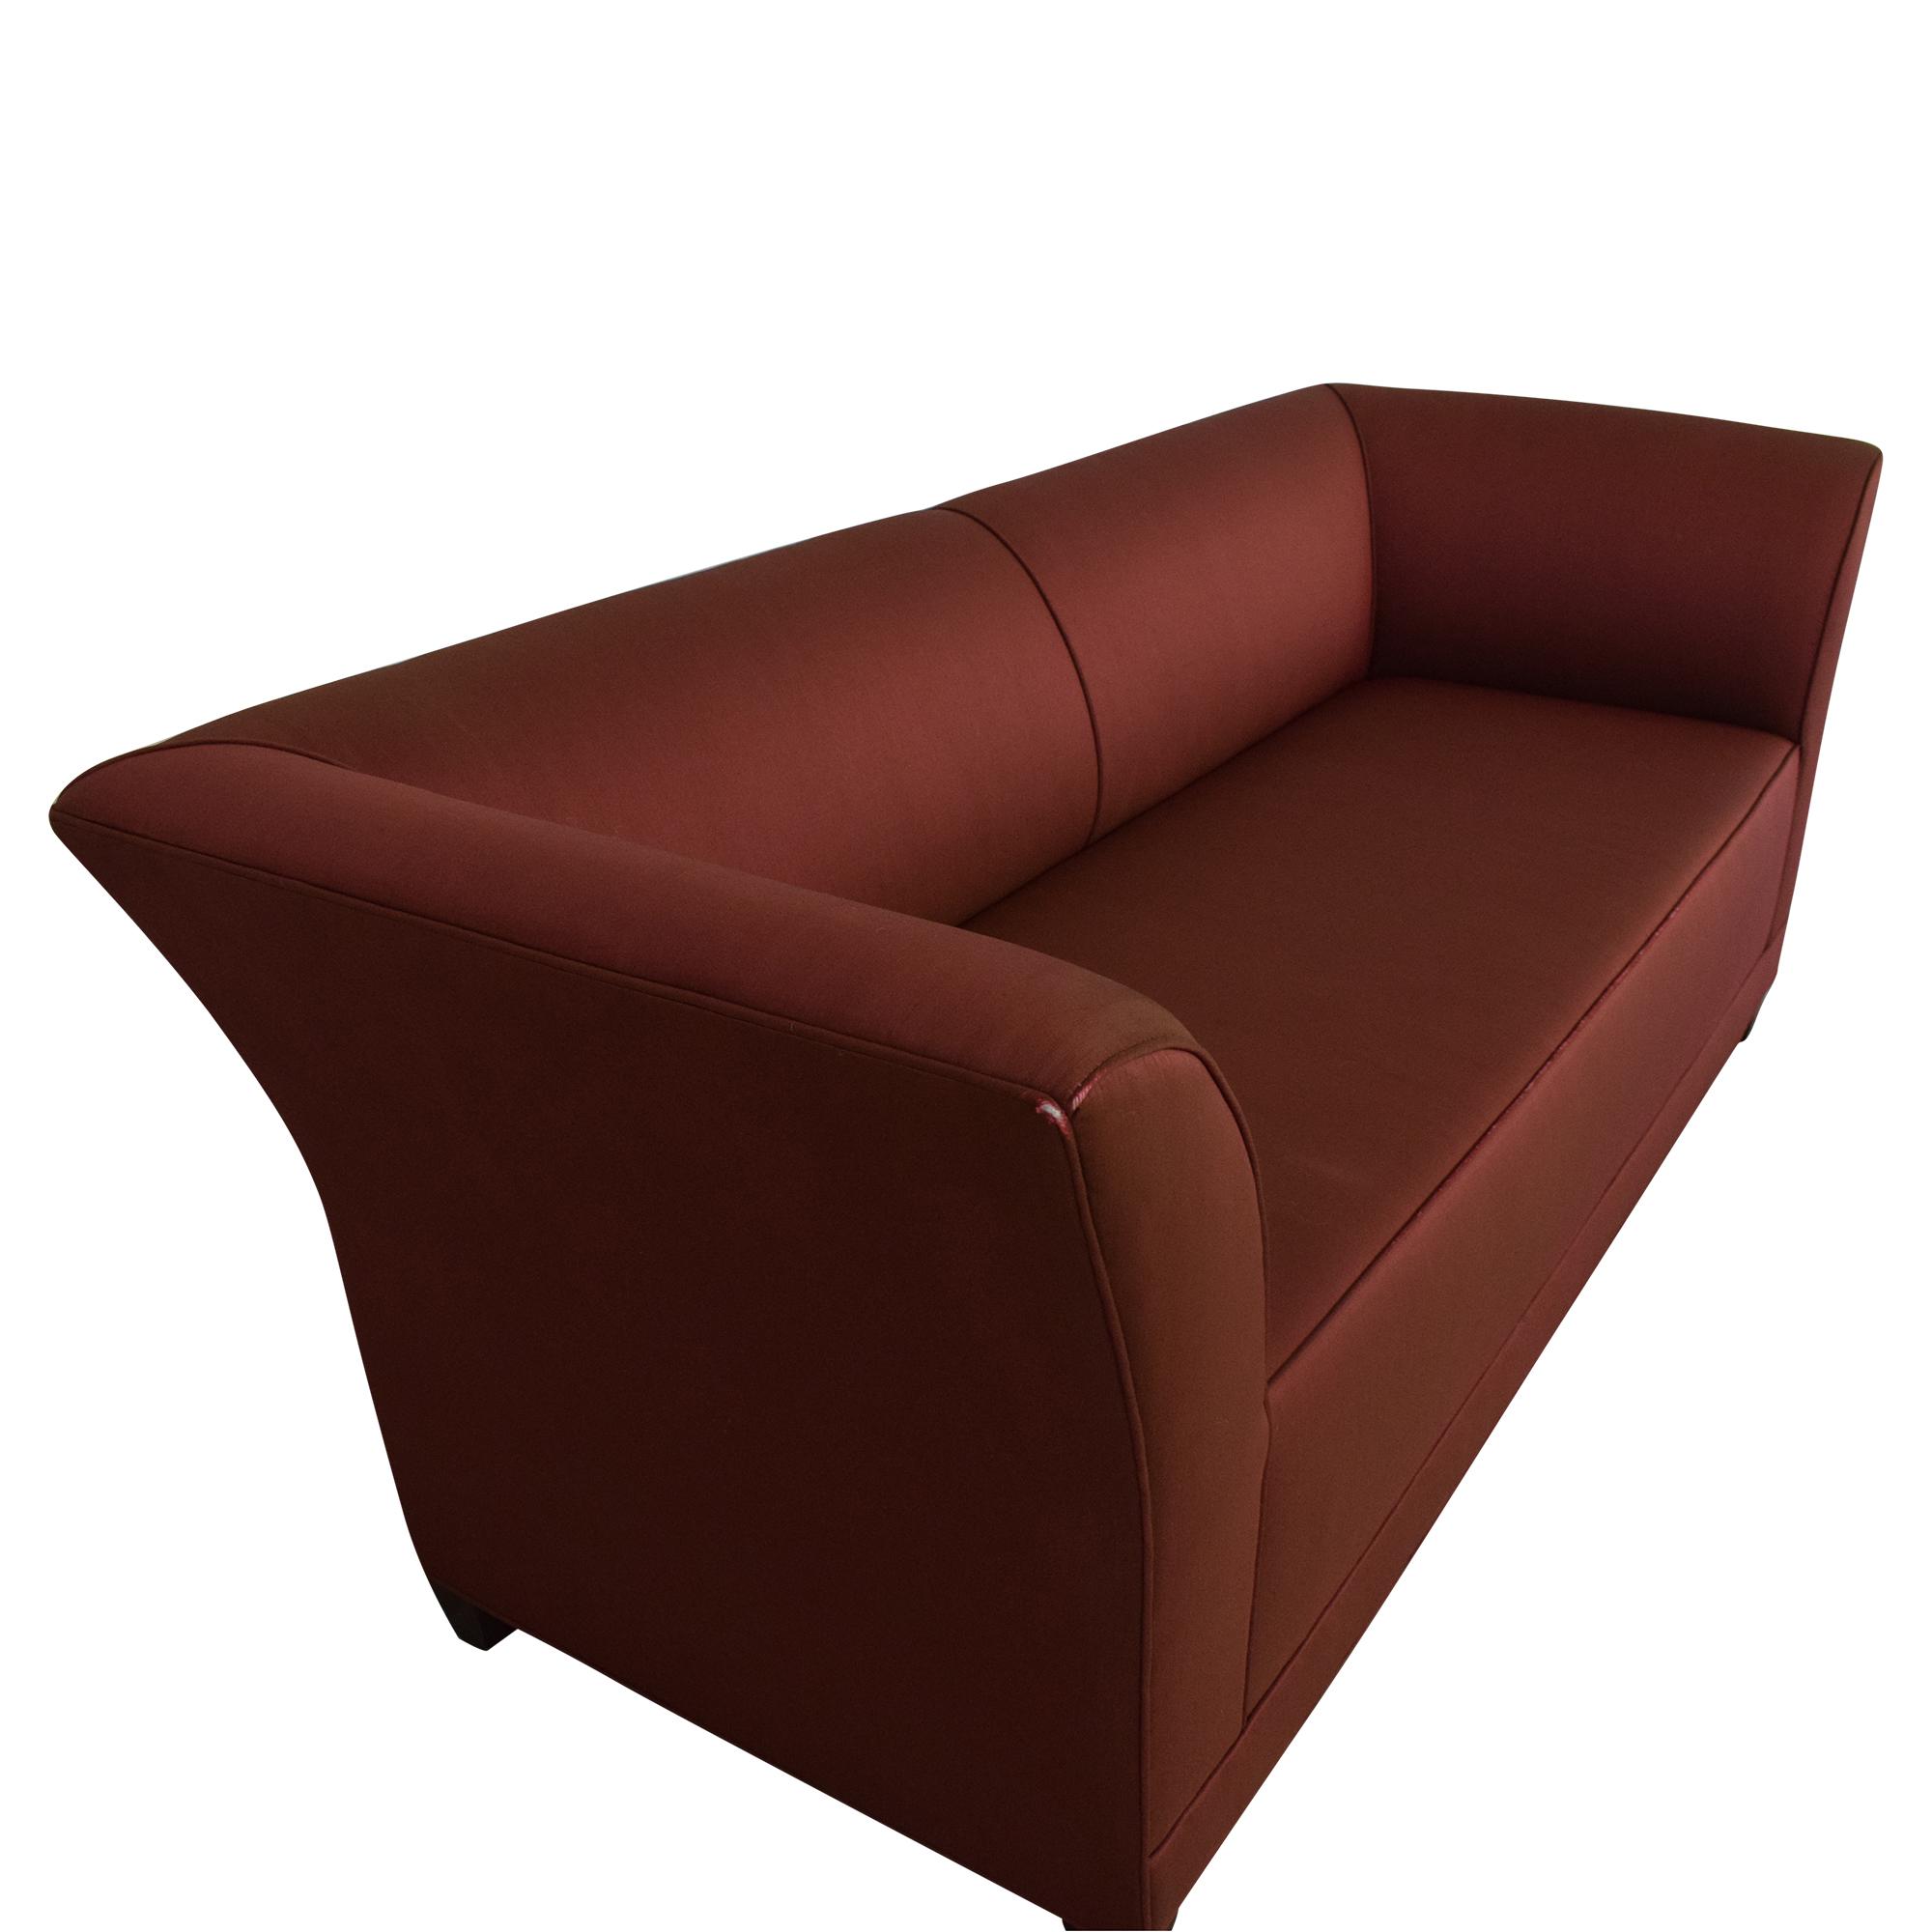 Todd Hase Todd Hase Tuxedo Sofa used